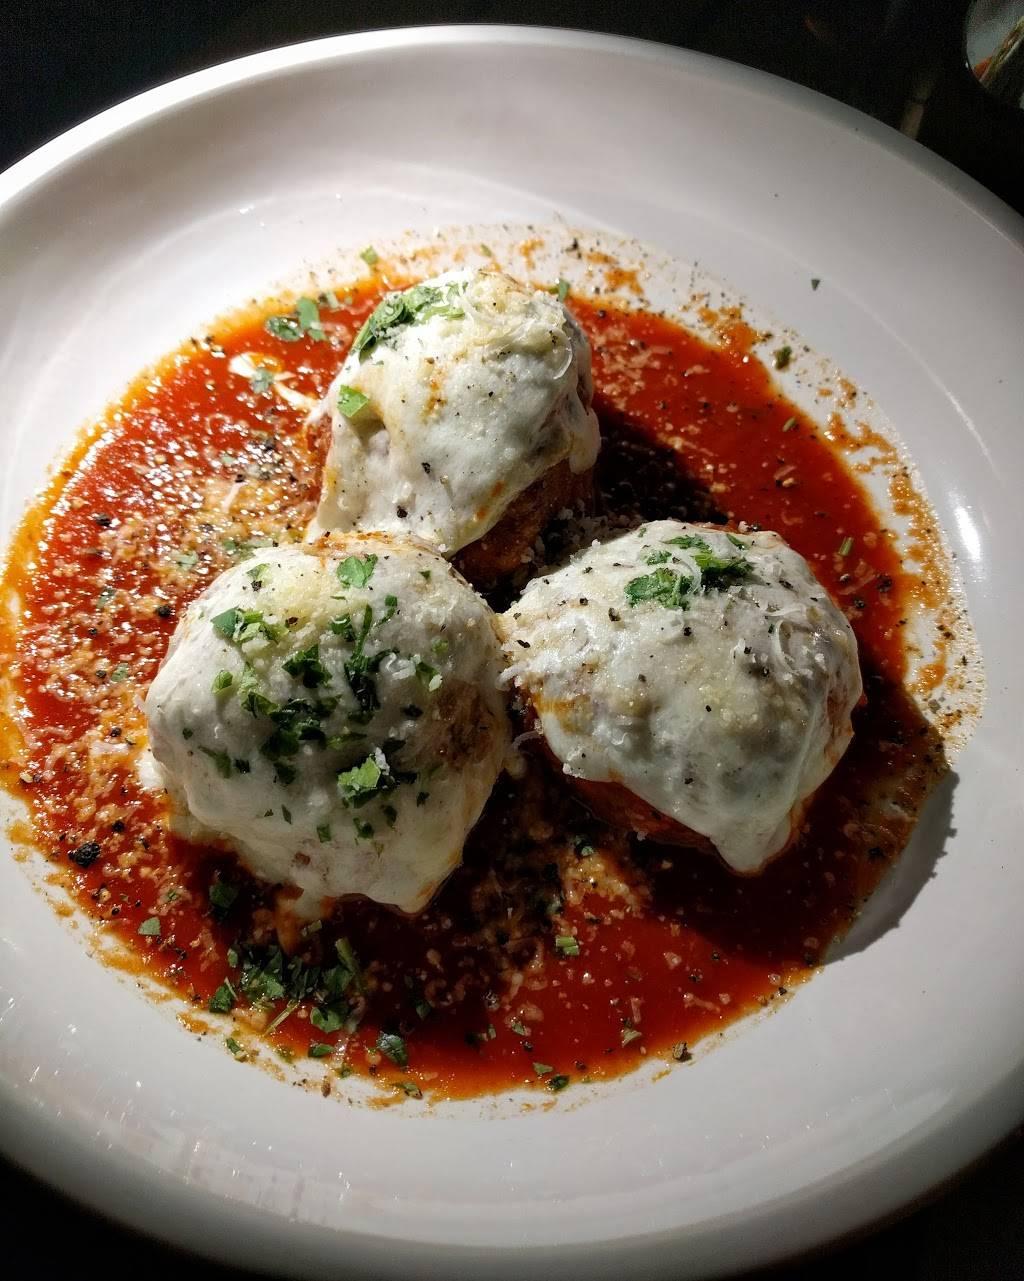 Leones Italian | restaurant | 455 Granby St, Norfolk, VA 23510, USA | 7576241455 OR +1 757-624-1455